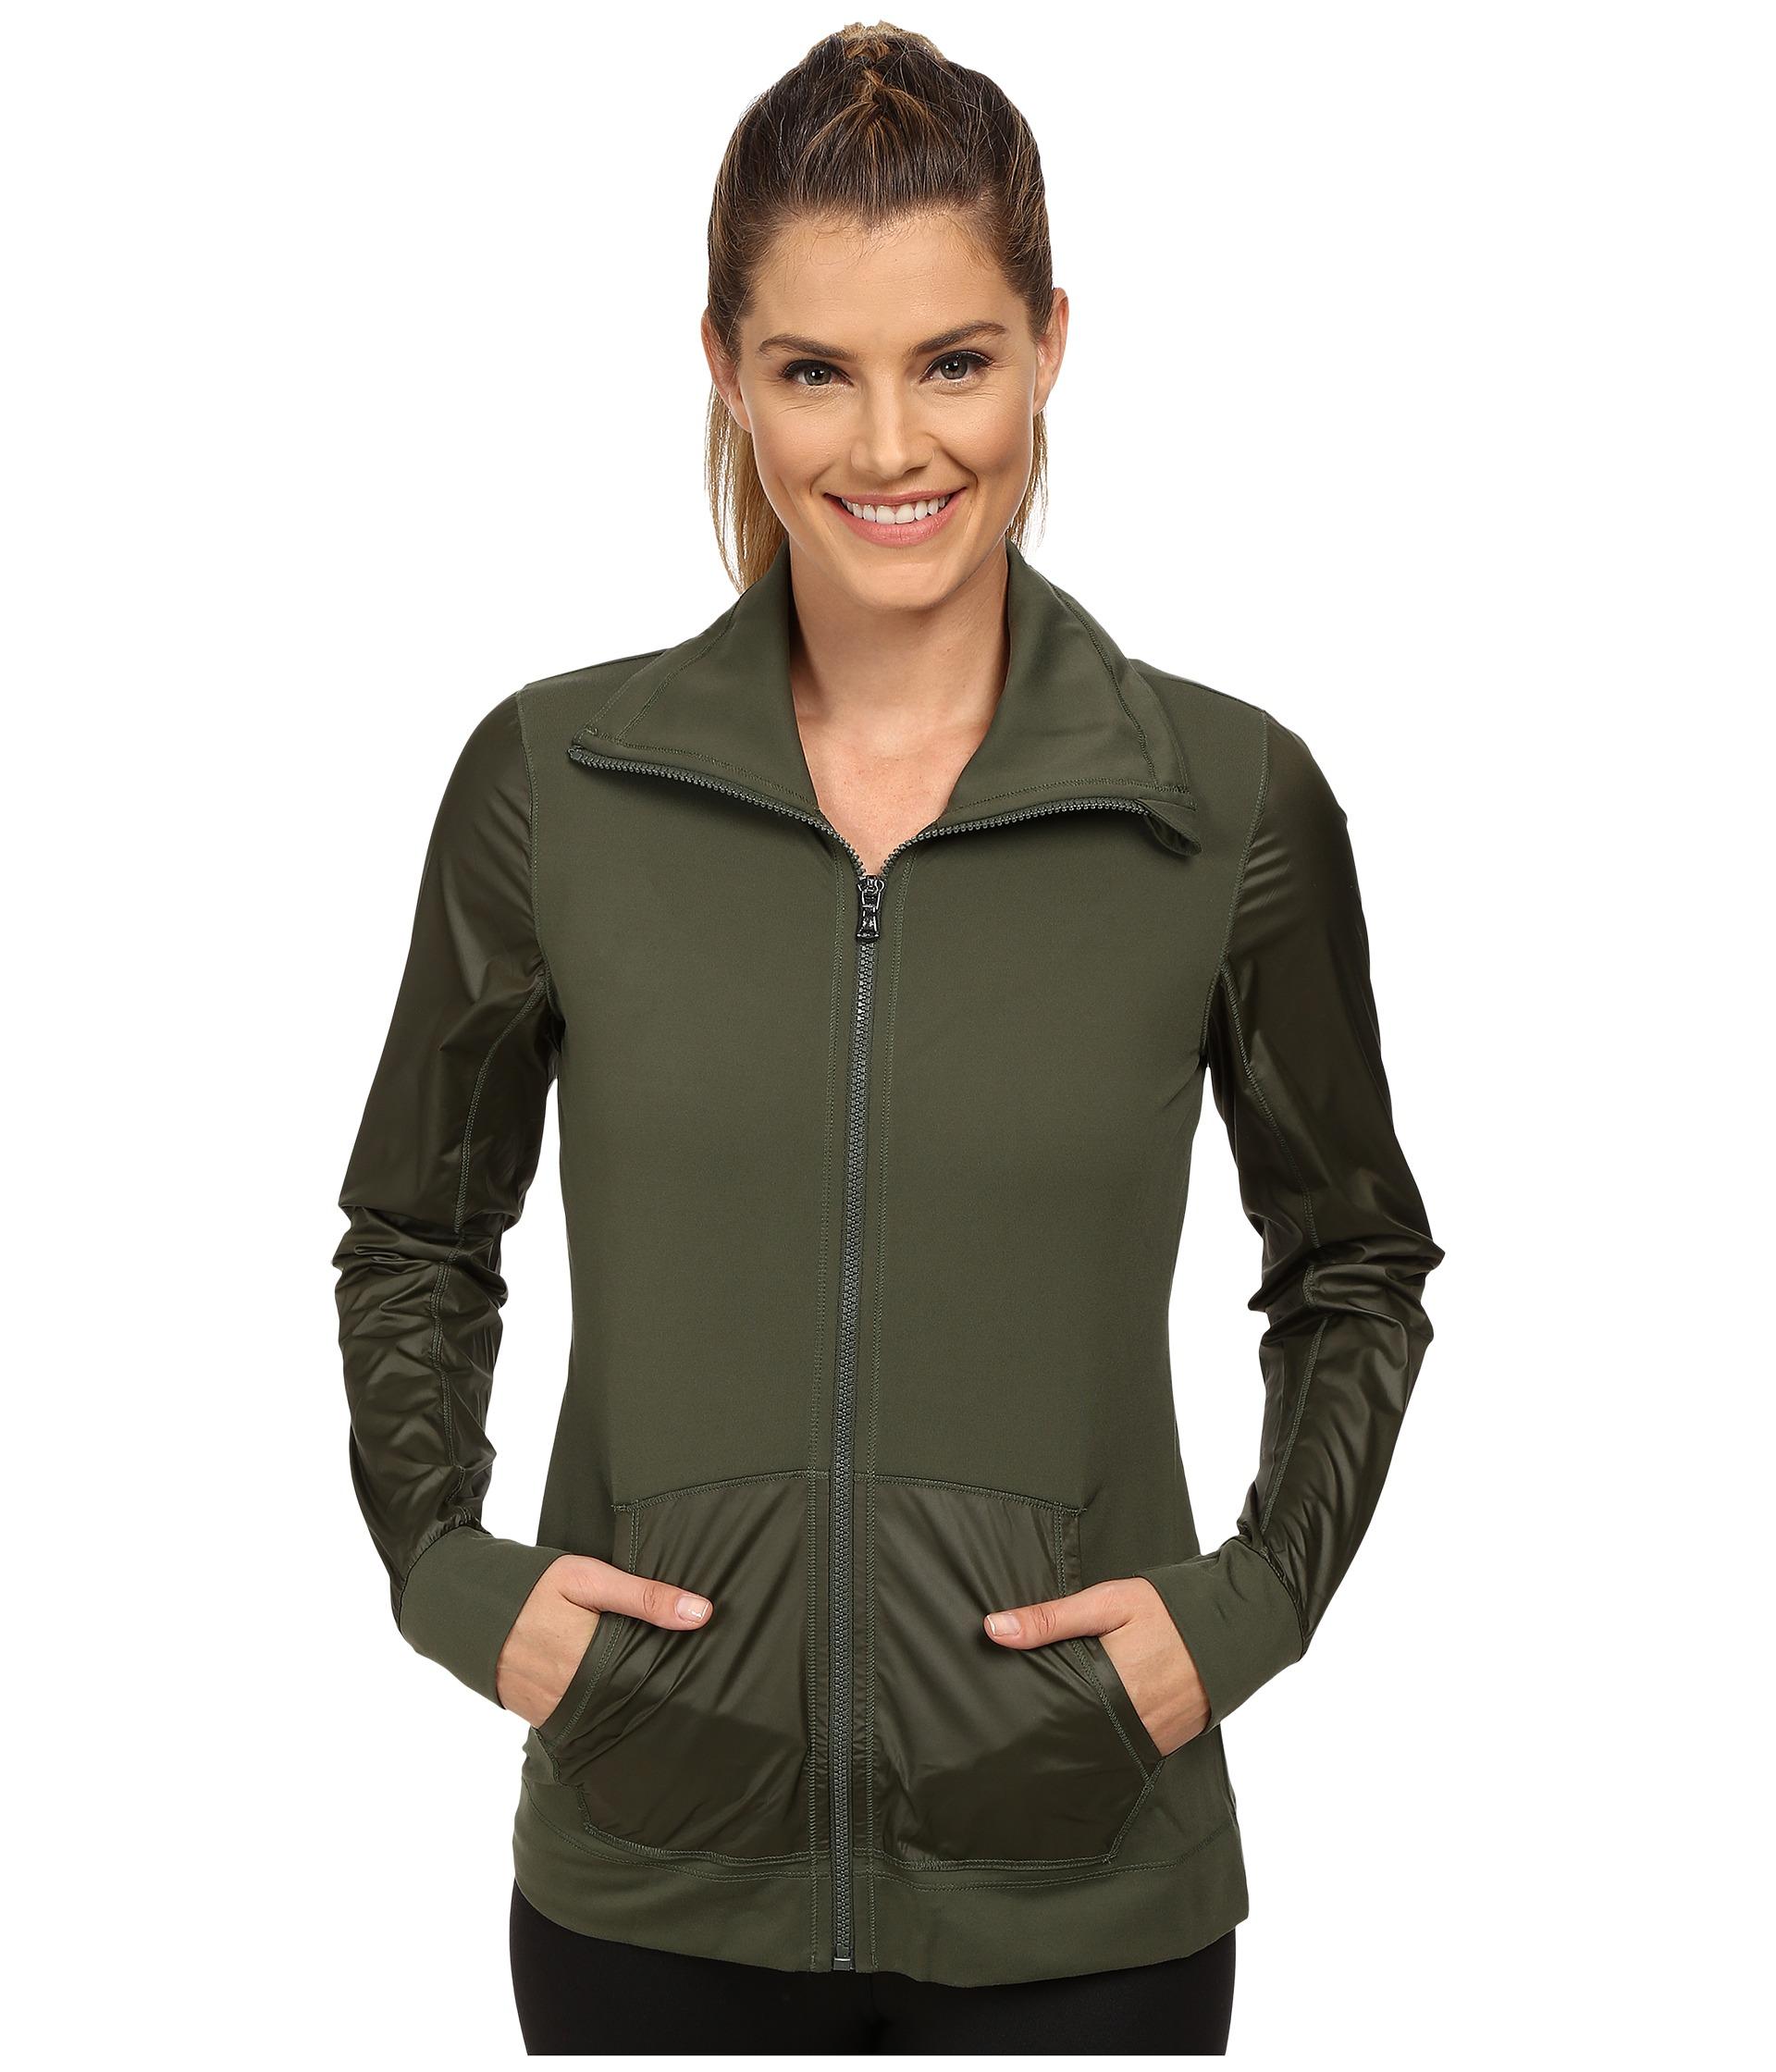 under armour jackets women 2017